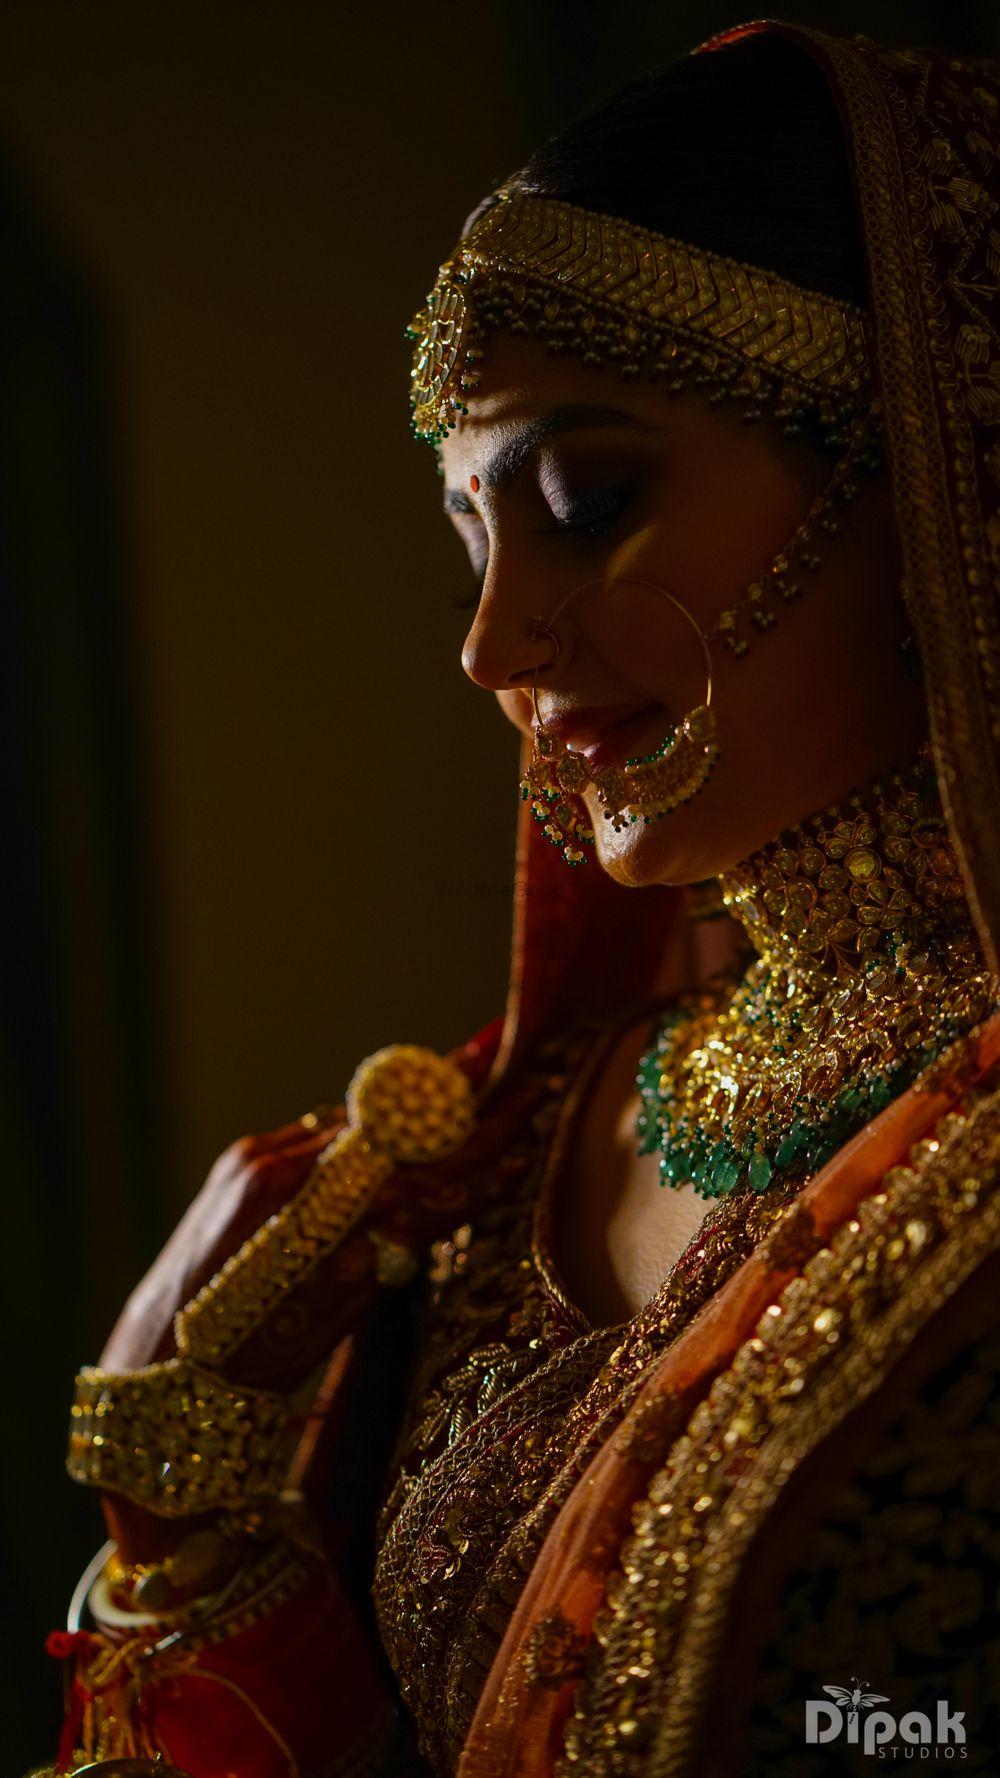 Photo of Imitation bridal mathapatti and choker